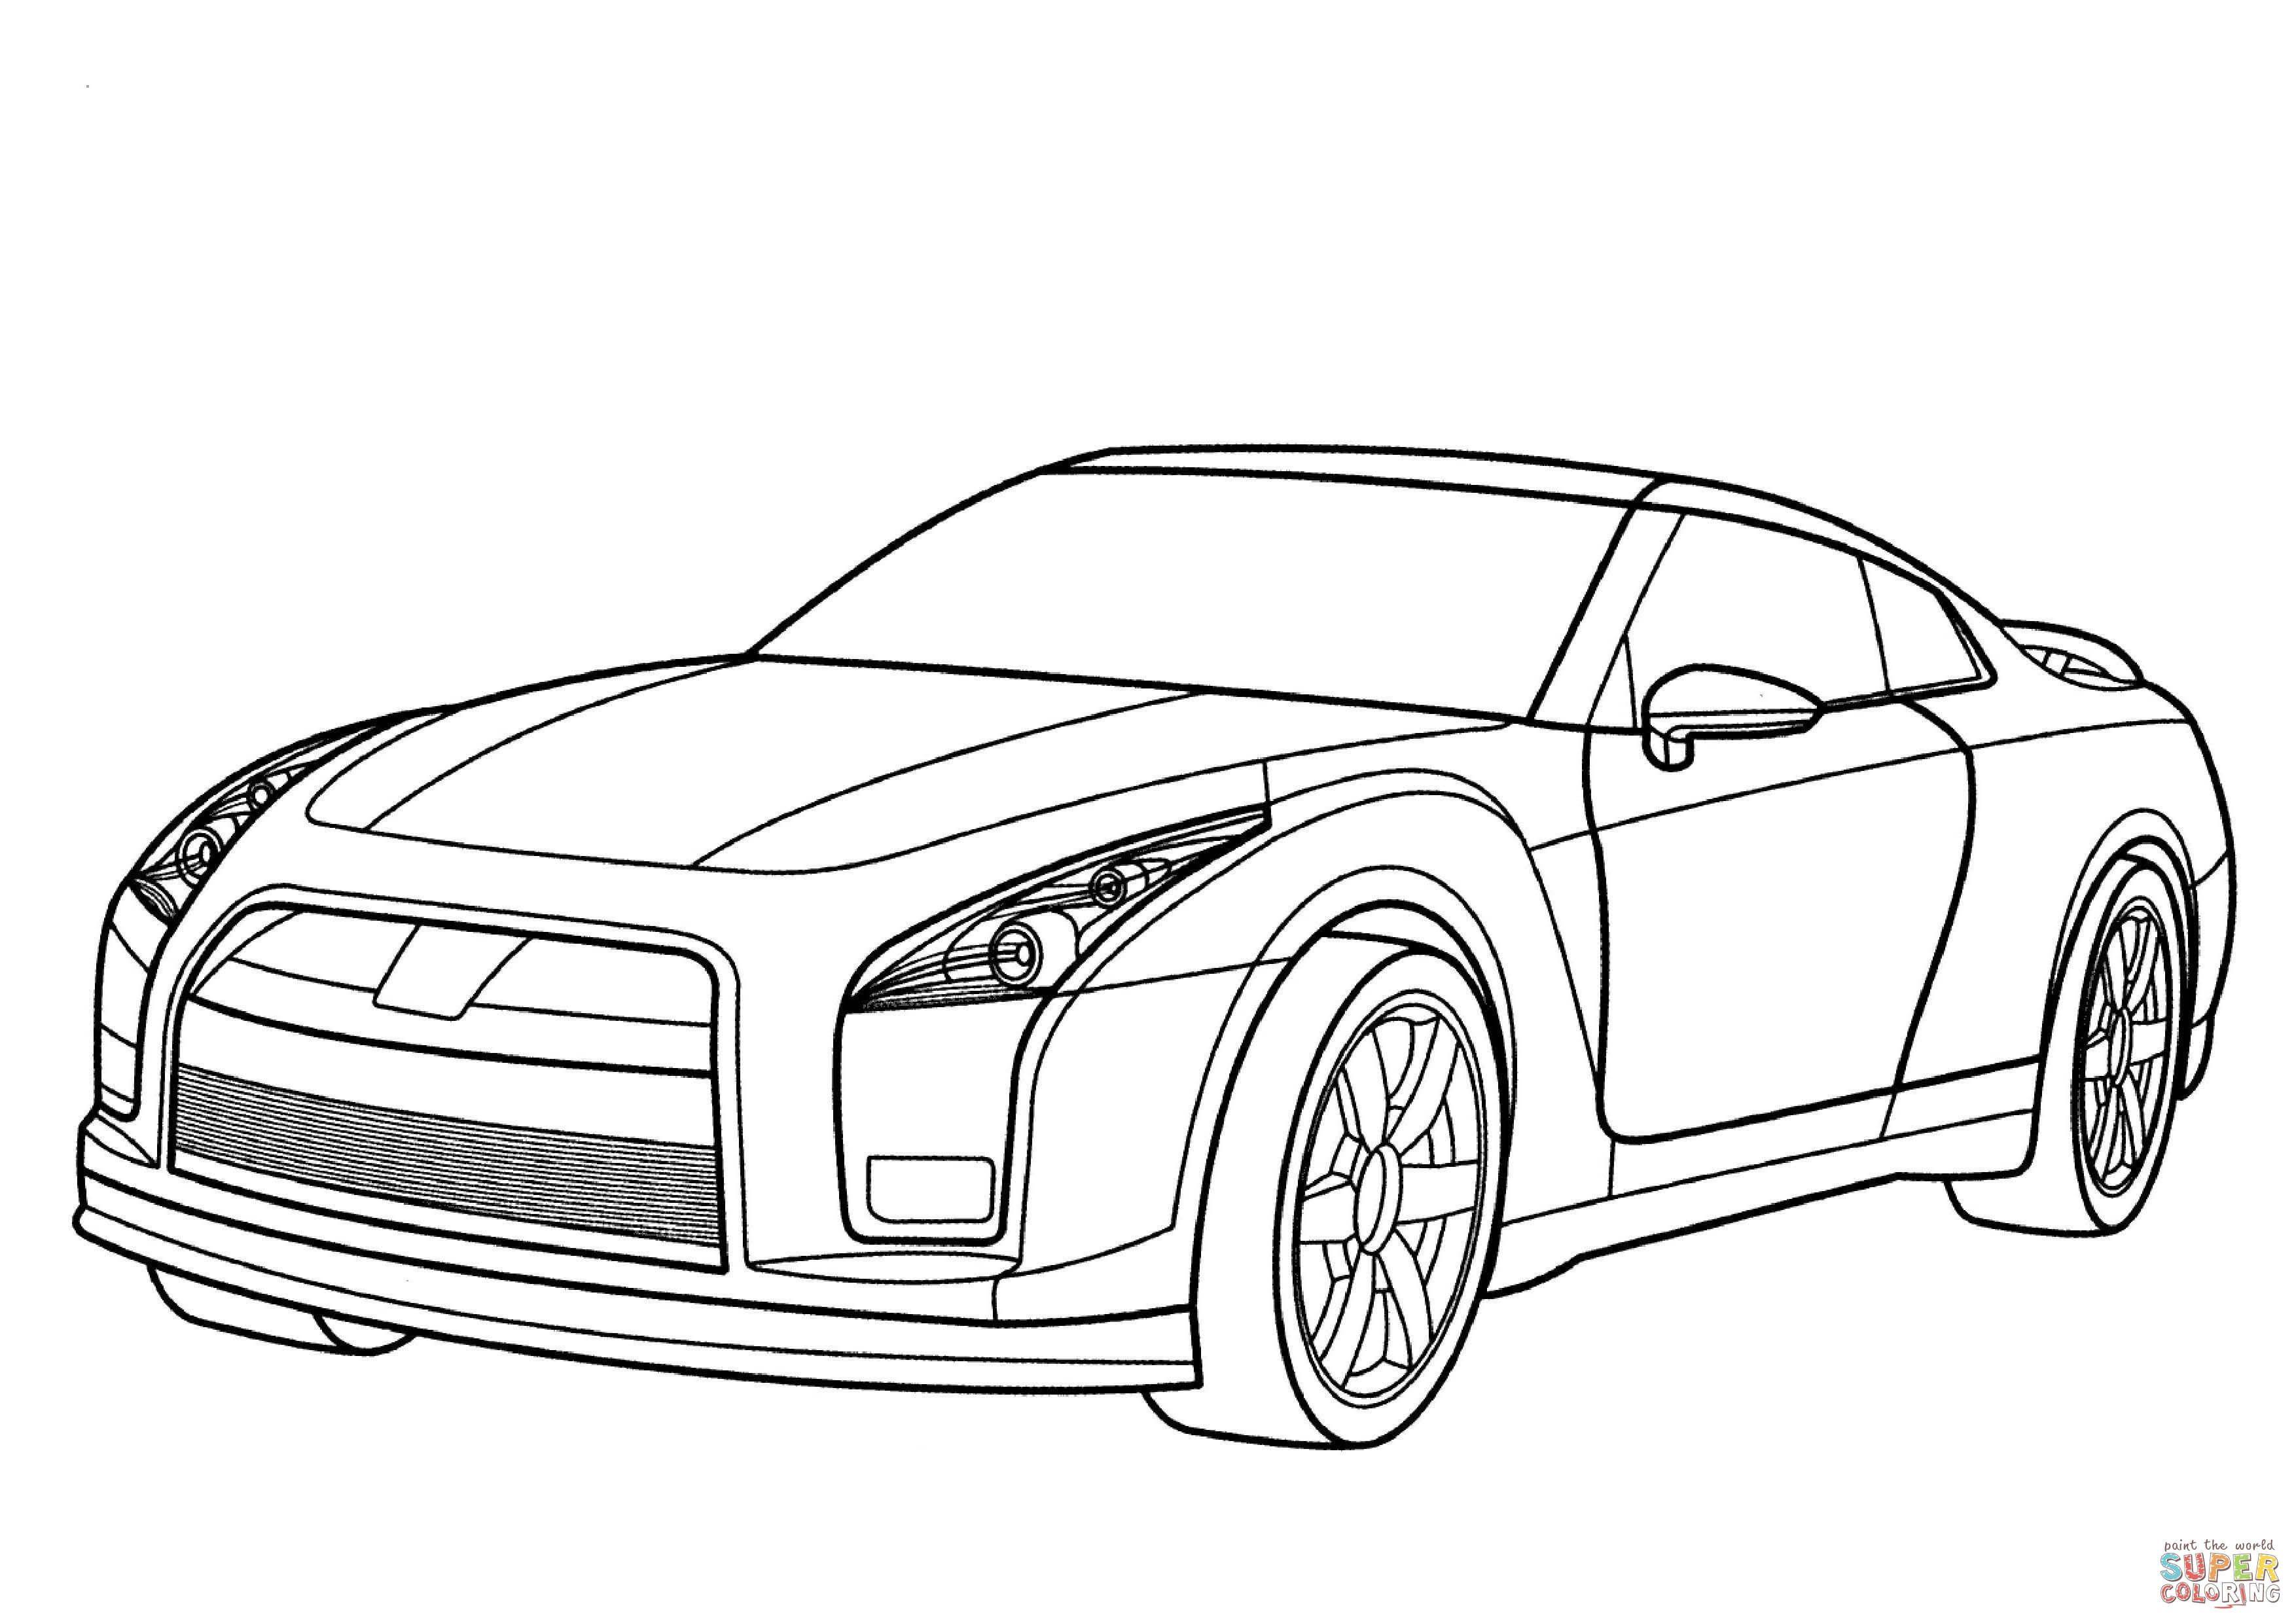 Kleurplaten Auto Ford Mustang.Nissan Gtr Kleurplaat Gratis Kleurplaten Printen Design Gtr